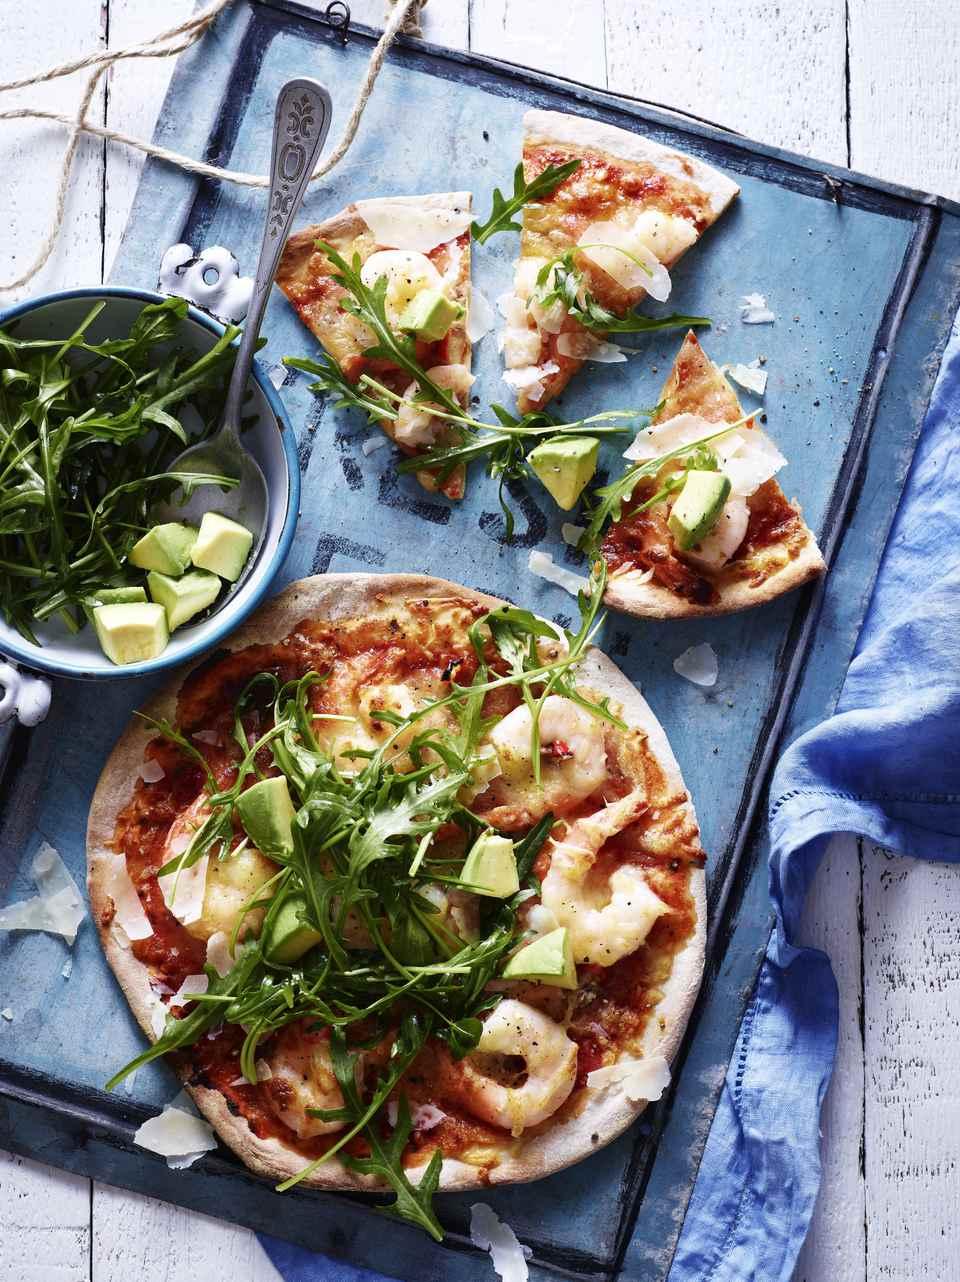 Still life of chili prawn pizza with rocket salad